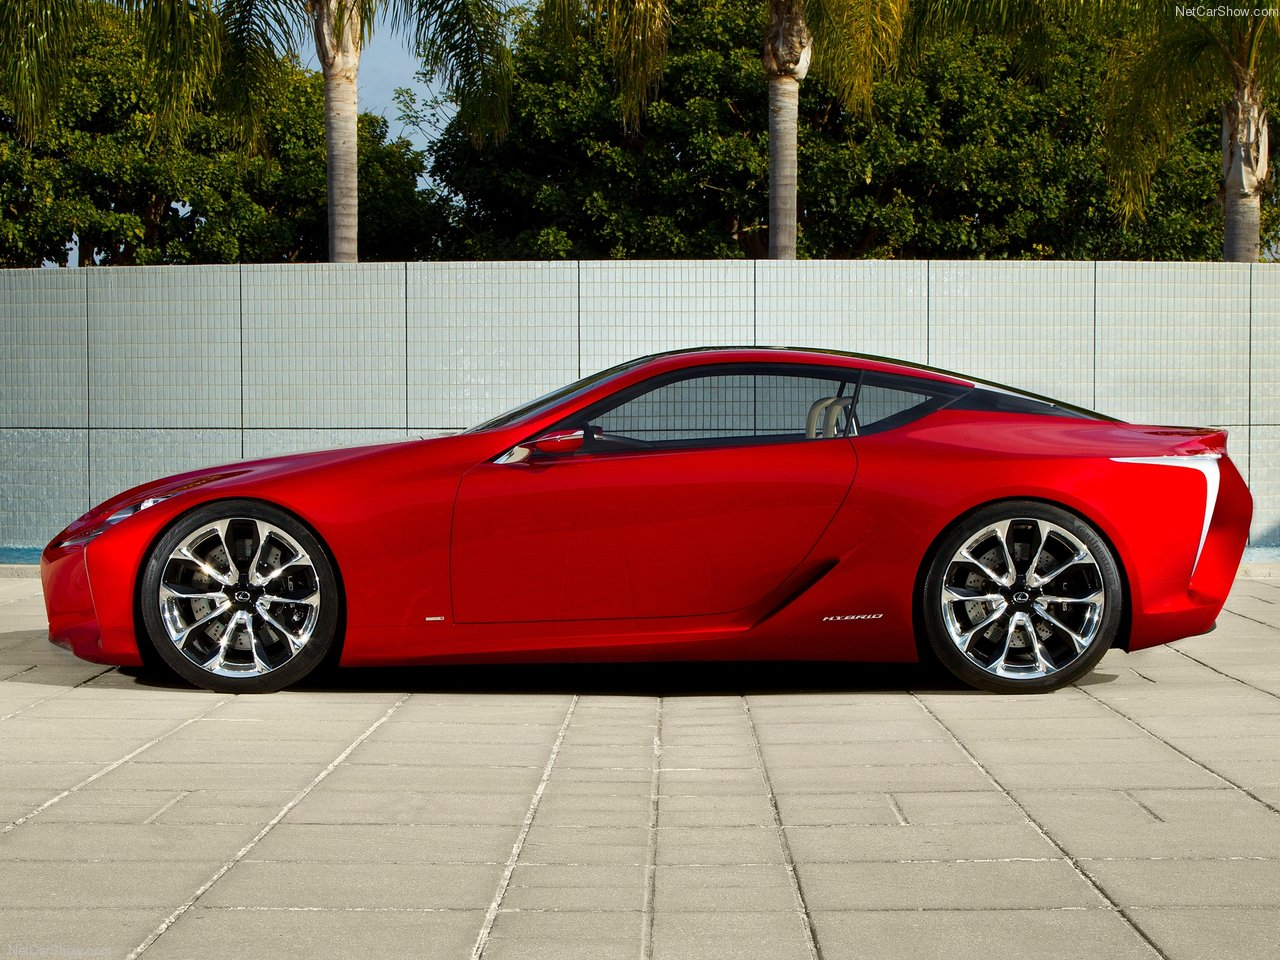 2012 Lexus LF-LC Concept | Man On Fire Design